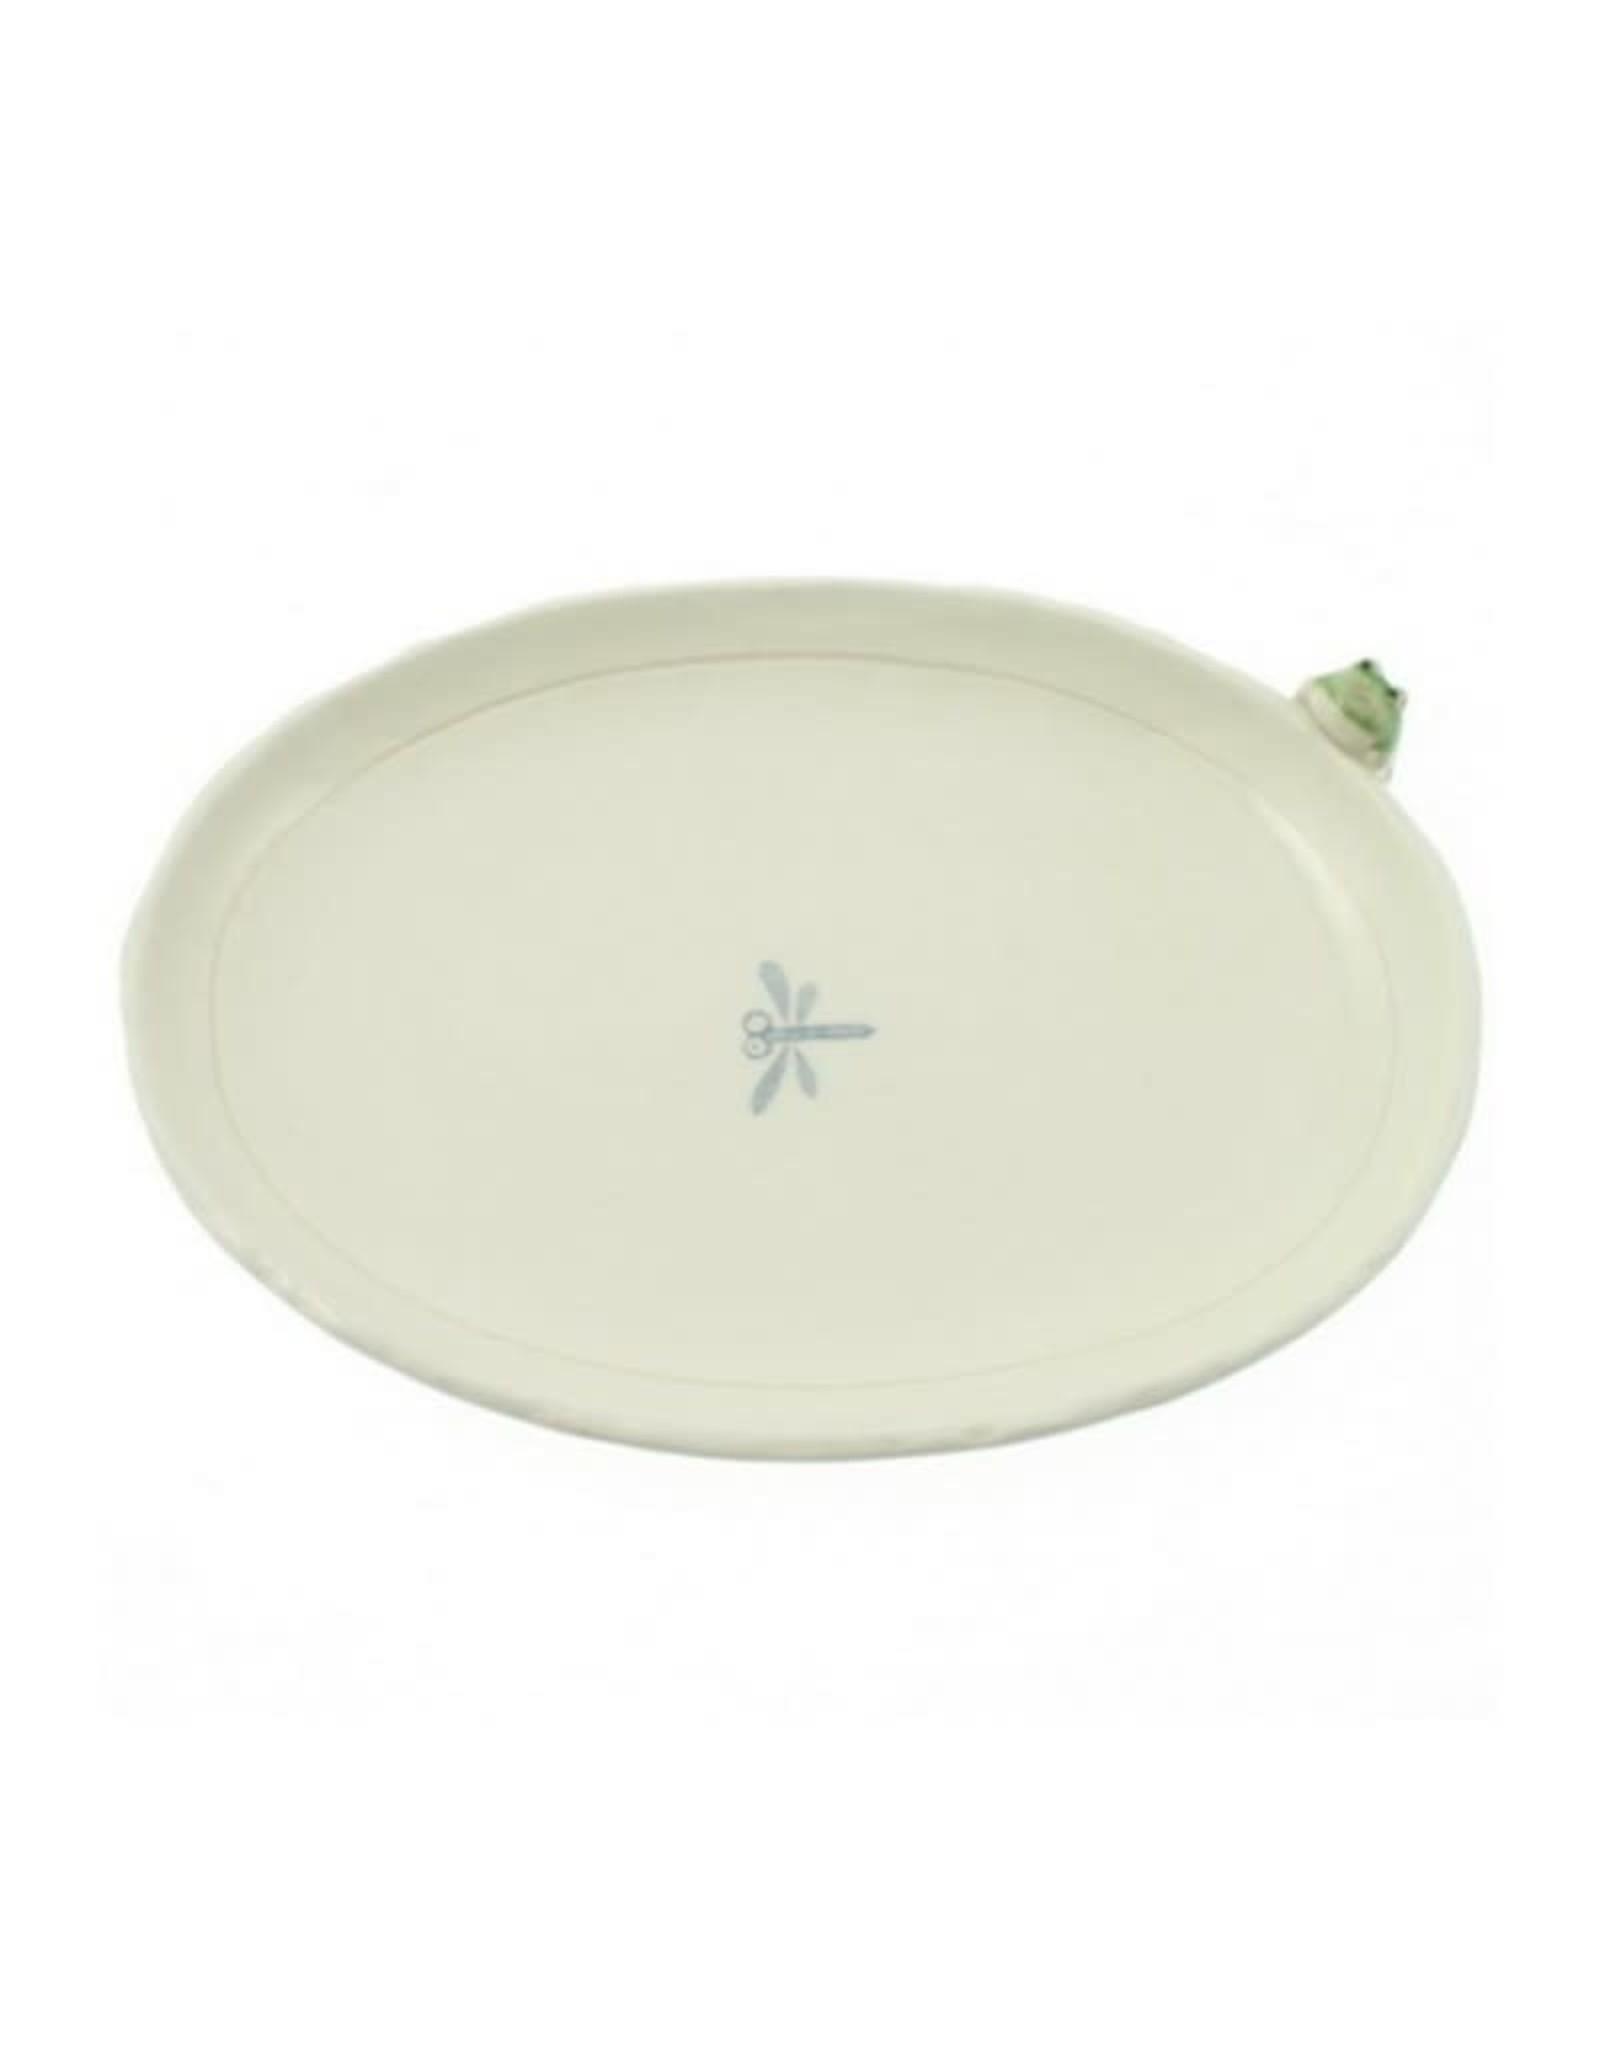 Kotobuki Trading Co. Inc Plate Oblong Frog/Dragonfly